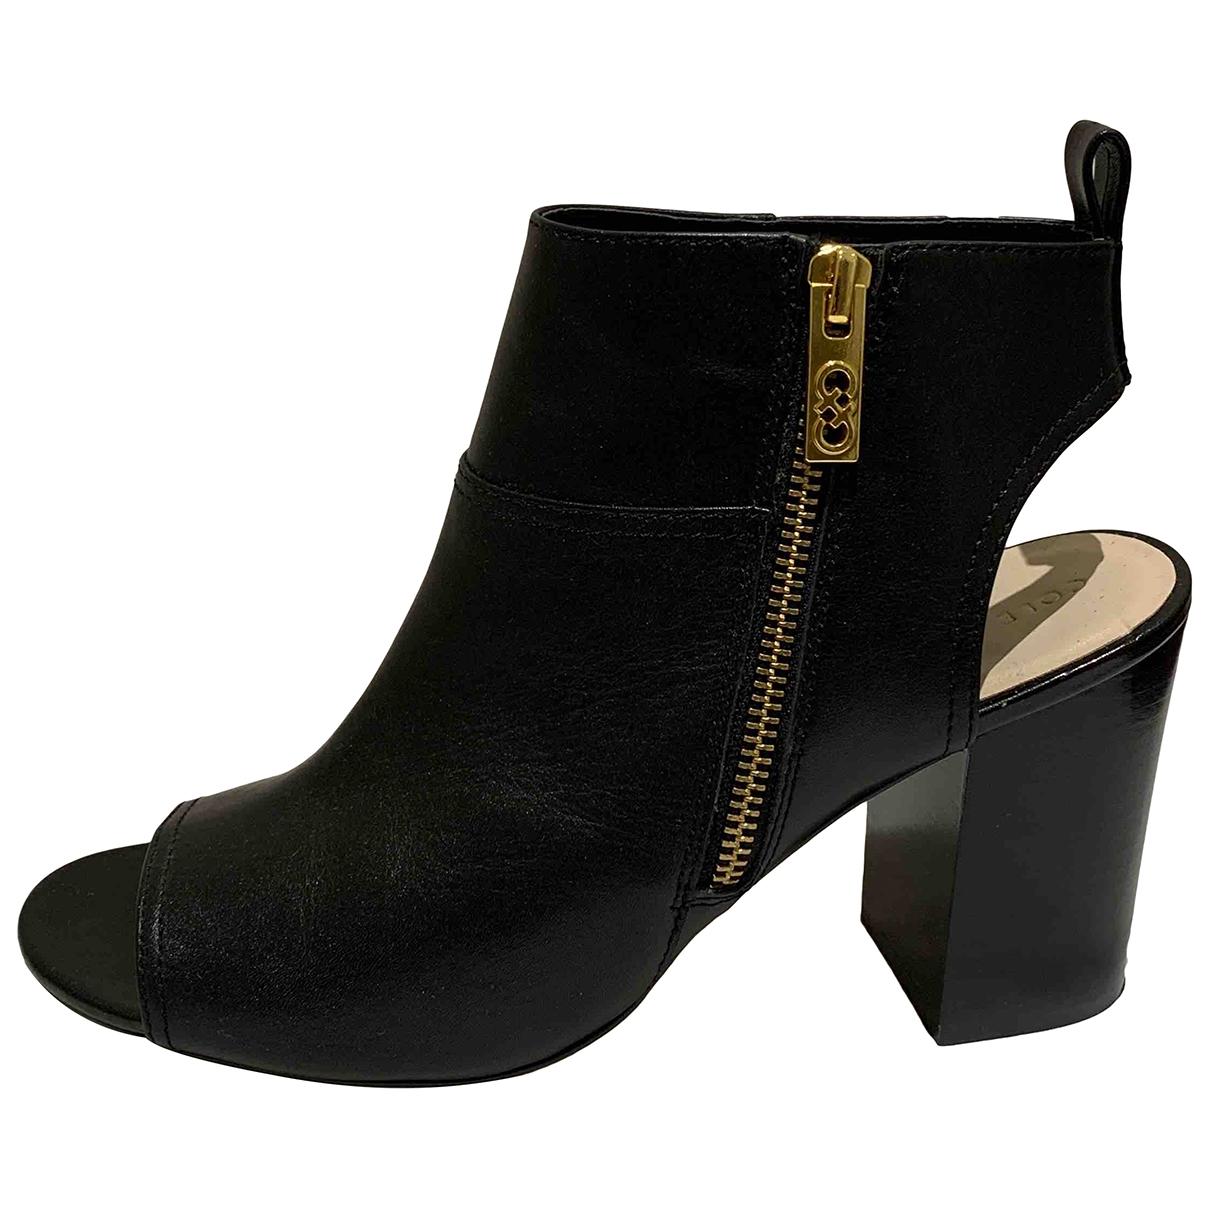 Cole Haan \N Black Leather Heels for Women 8.5 US